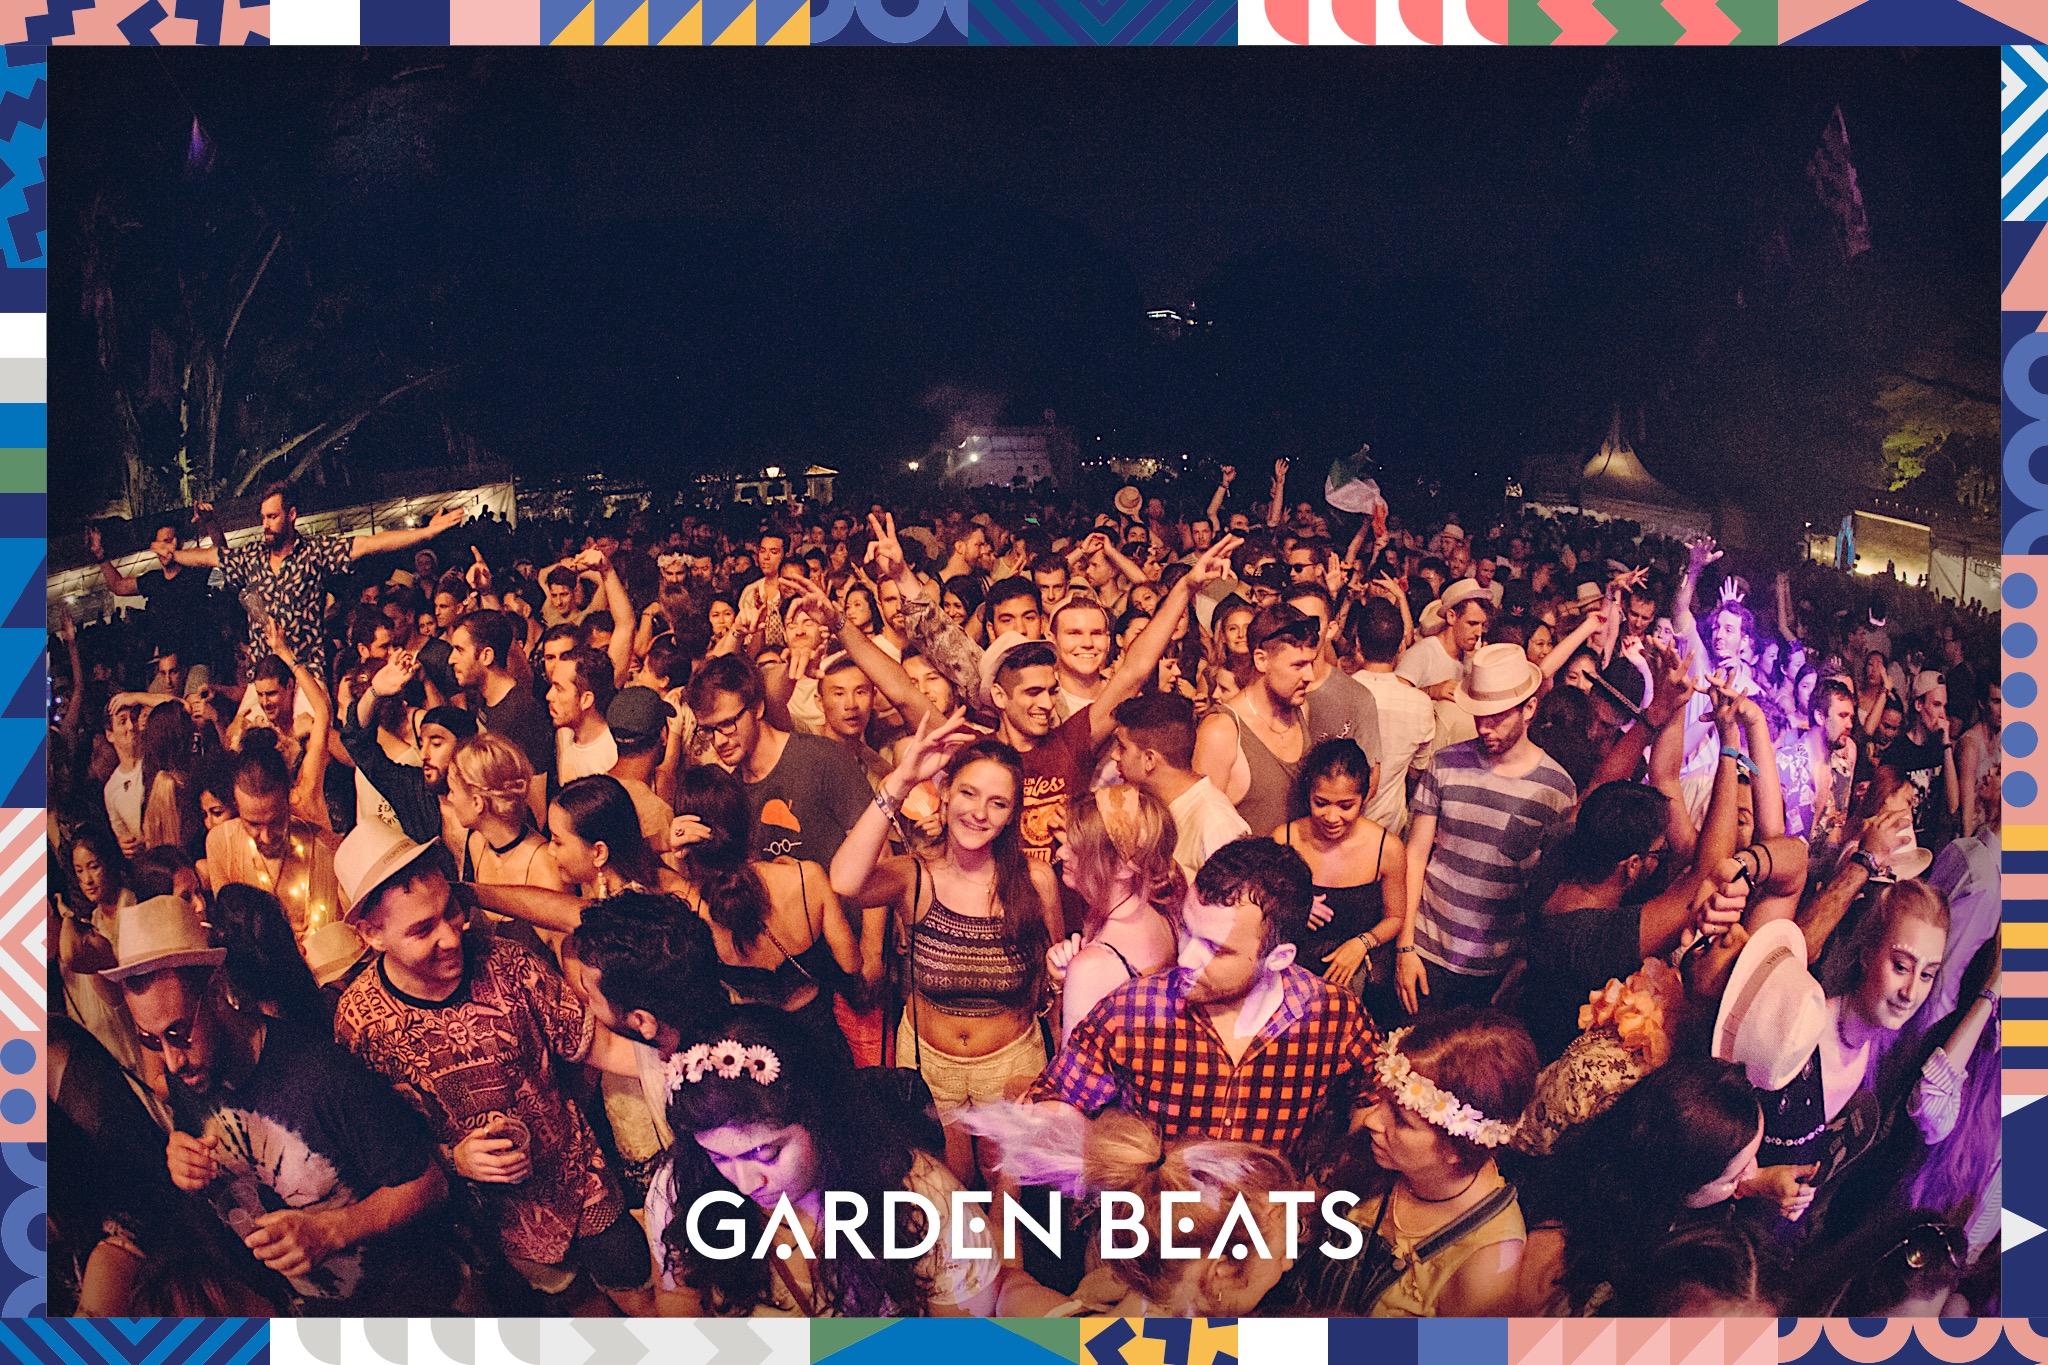 18032017_GardenBeats_Colossal821_WatermarkedGB.jpg